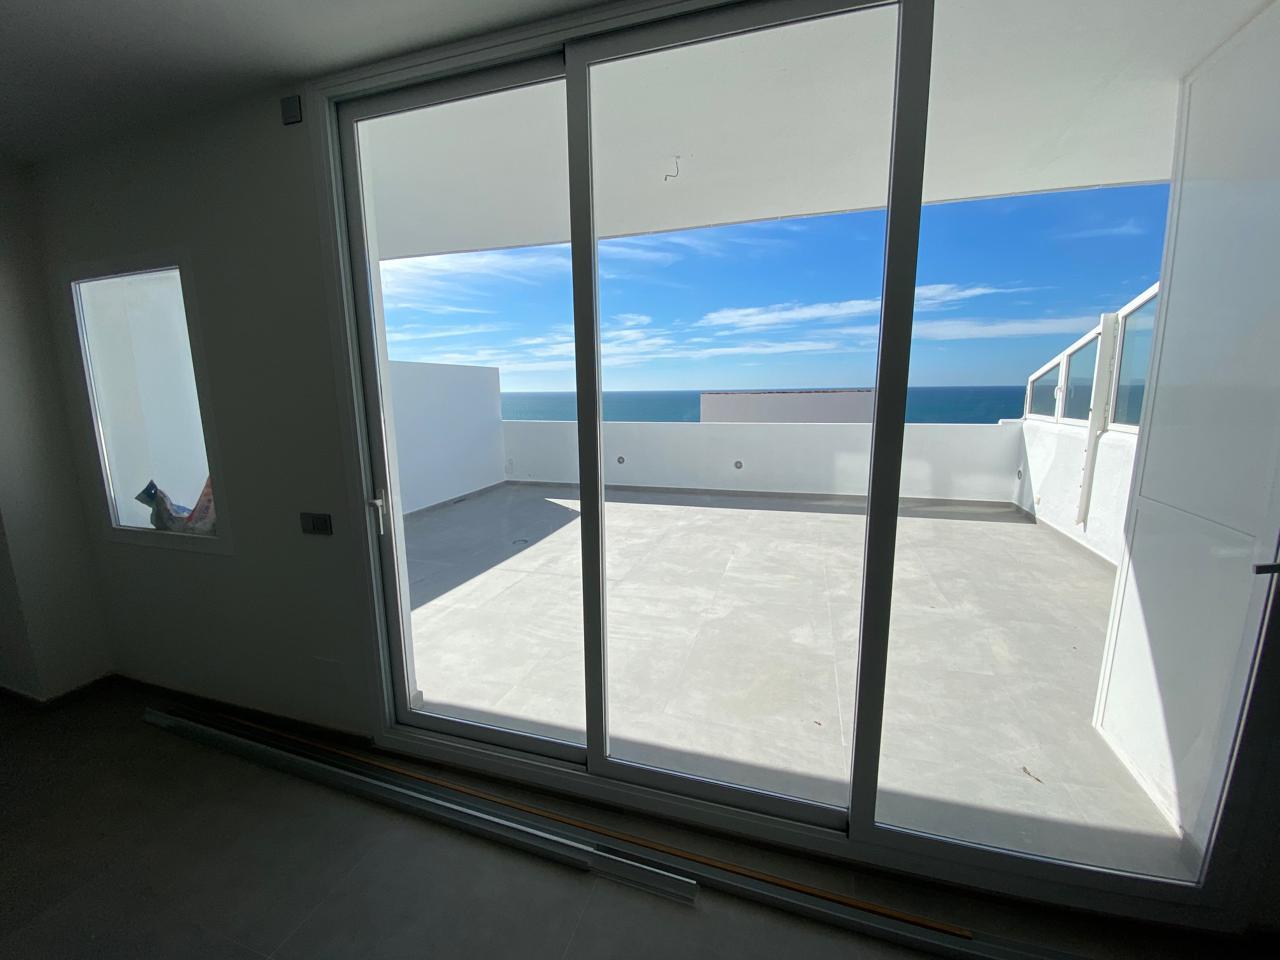 pisos en estepona · calle-capri-29693 695000€